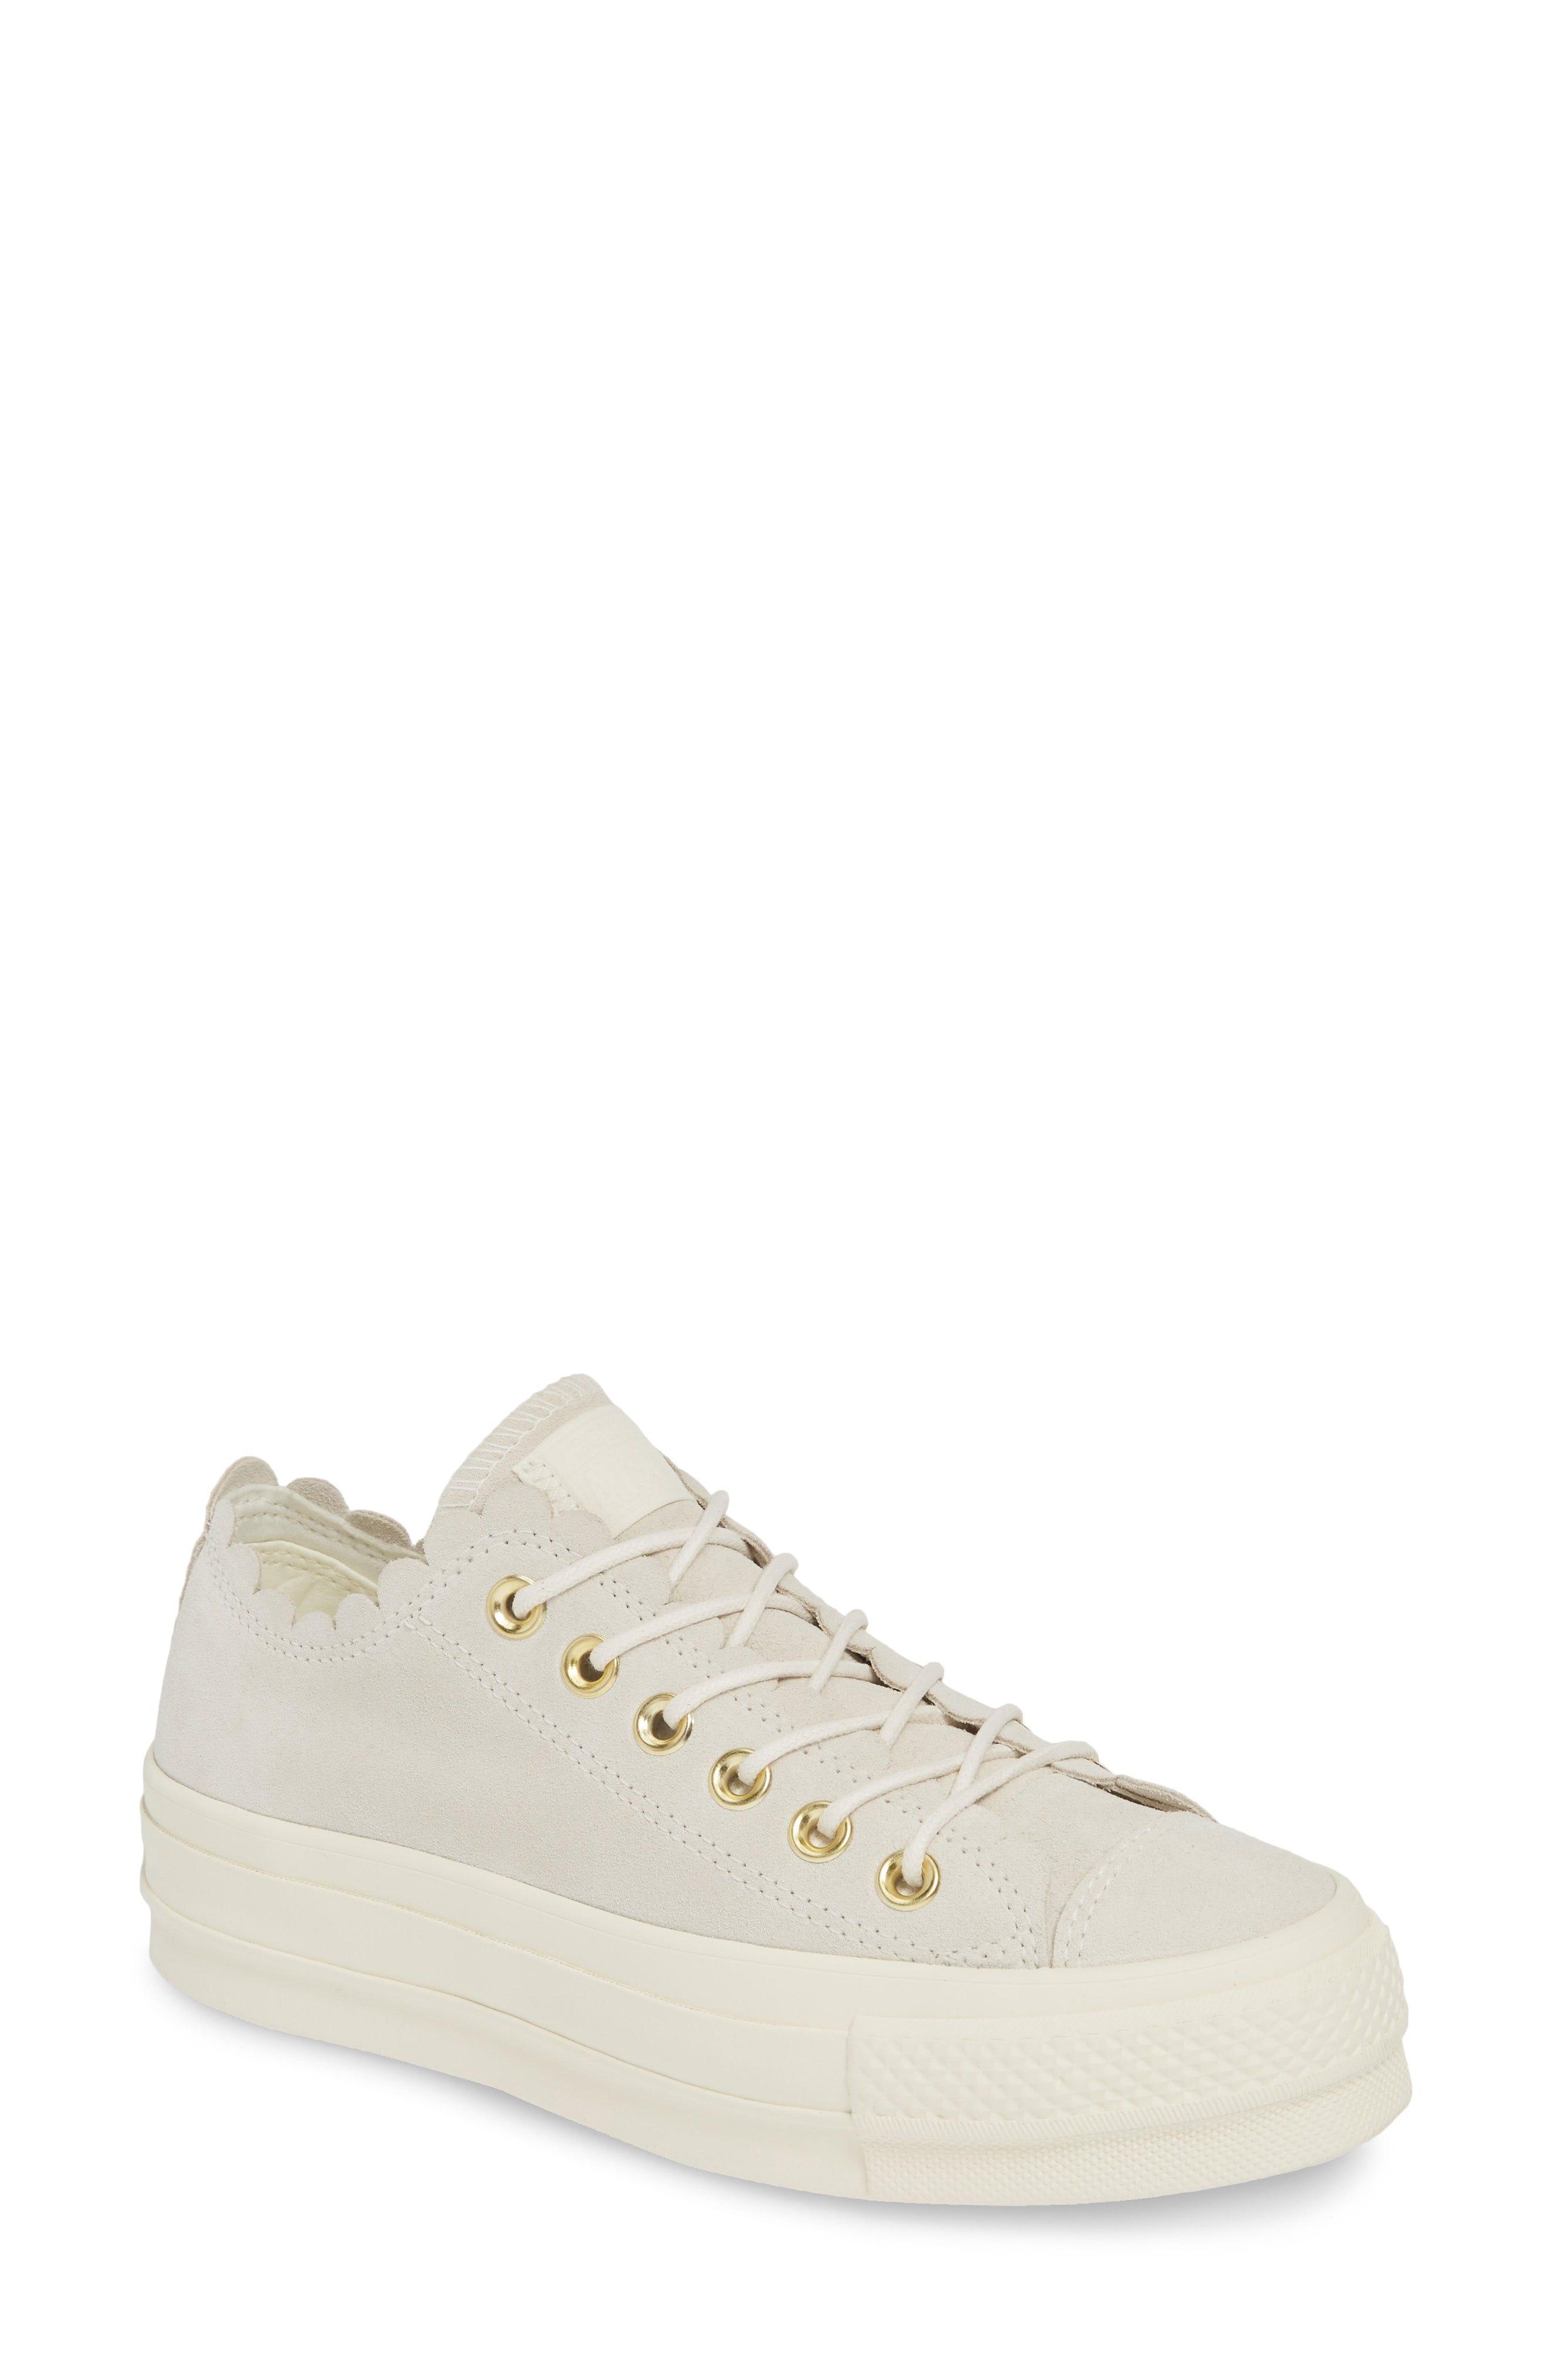 0330e85bedac Shop Footwear Trends From Paris Fashion Week